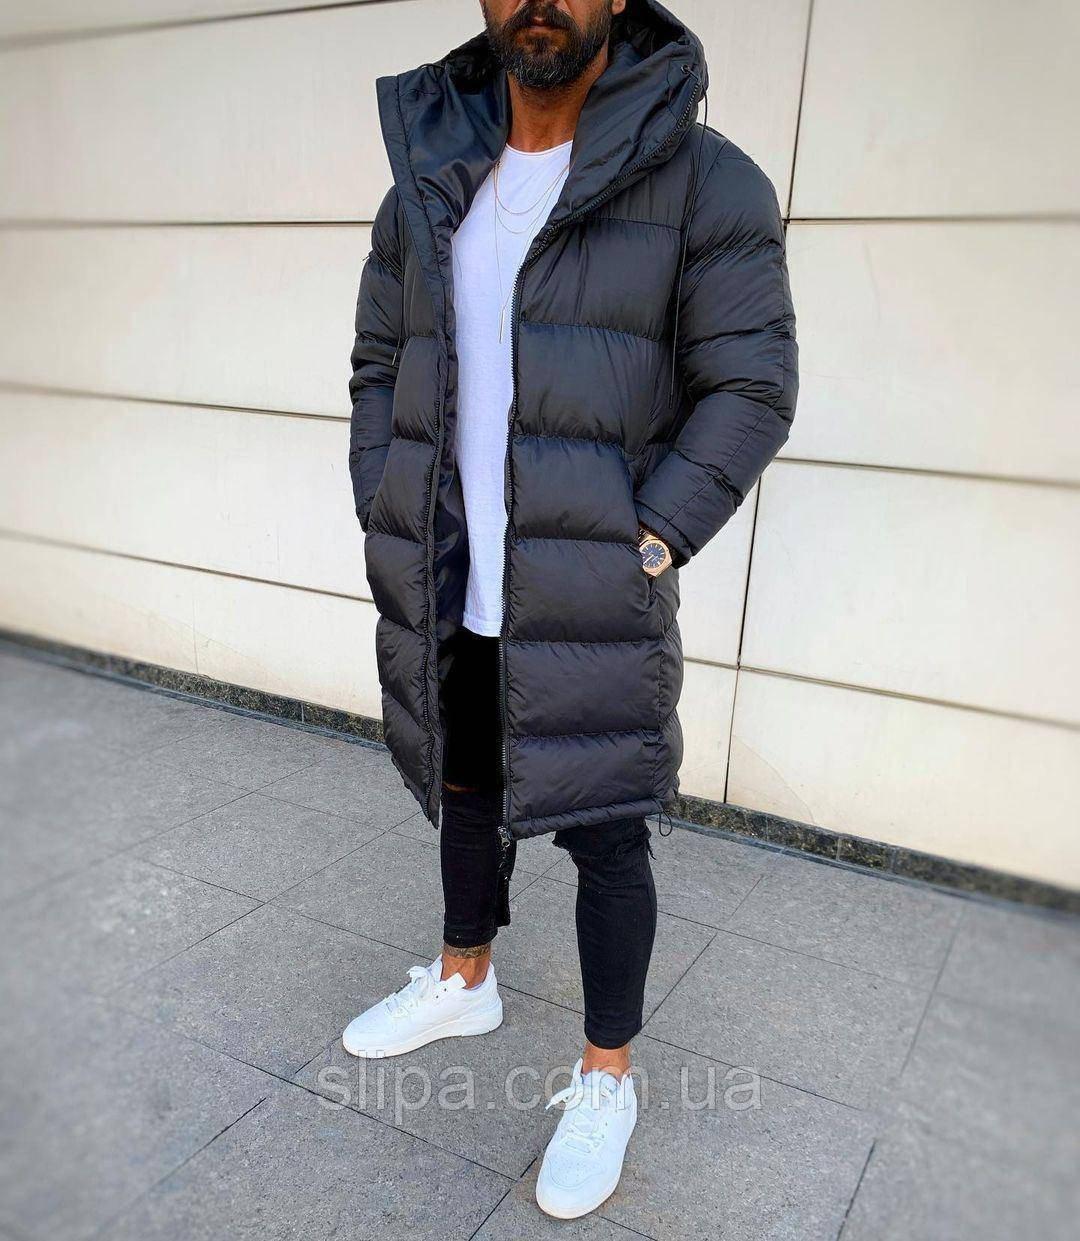 Мужская удлинённая зимняя куртка (Холлофайбер)